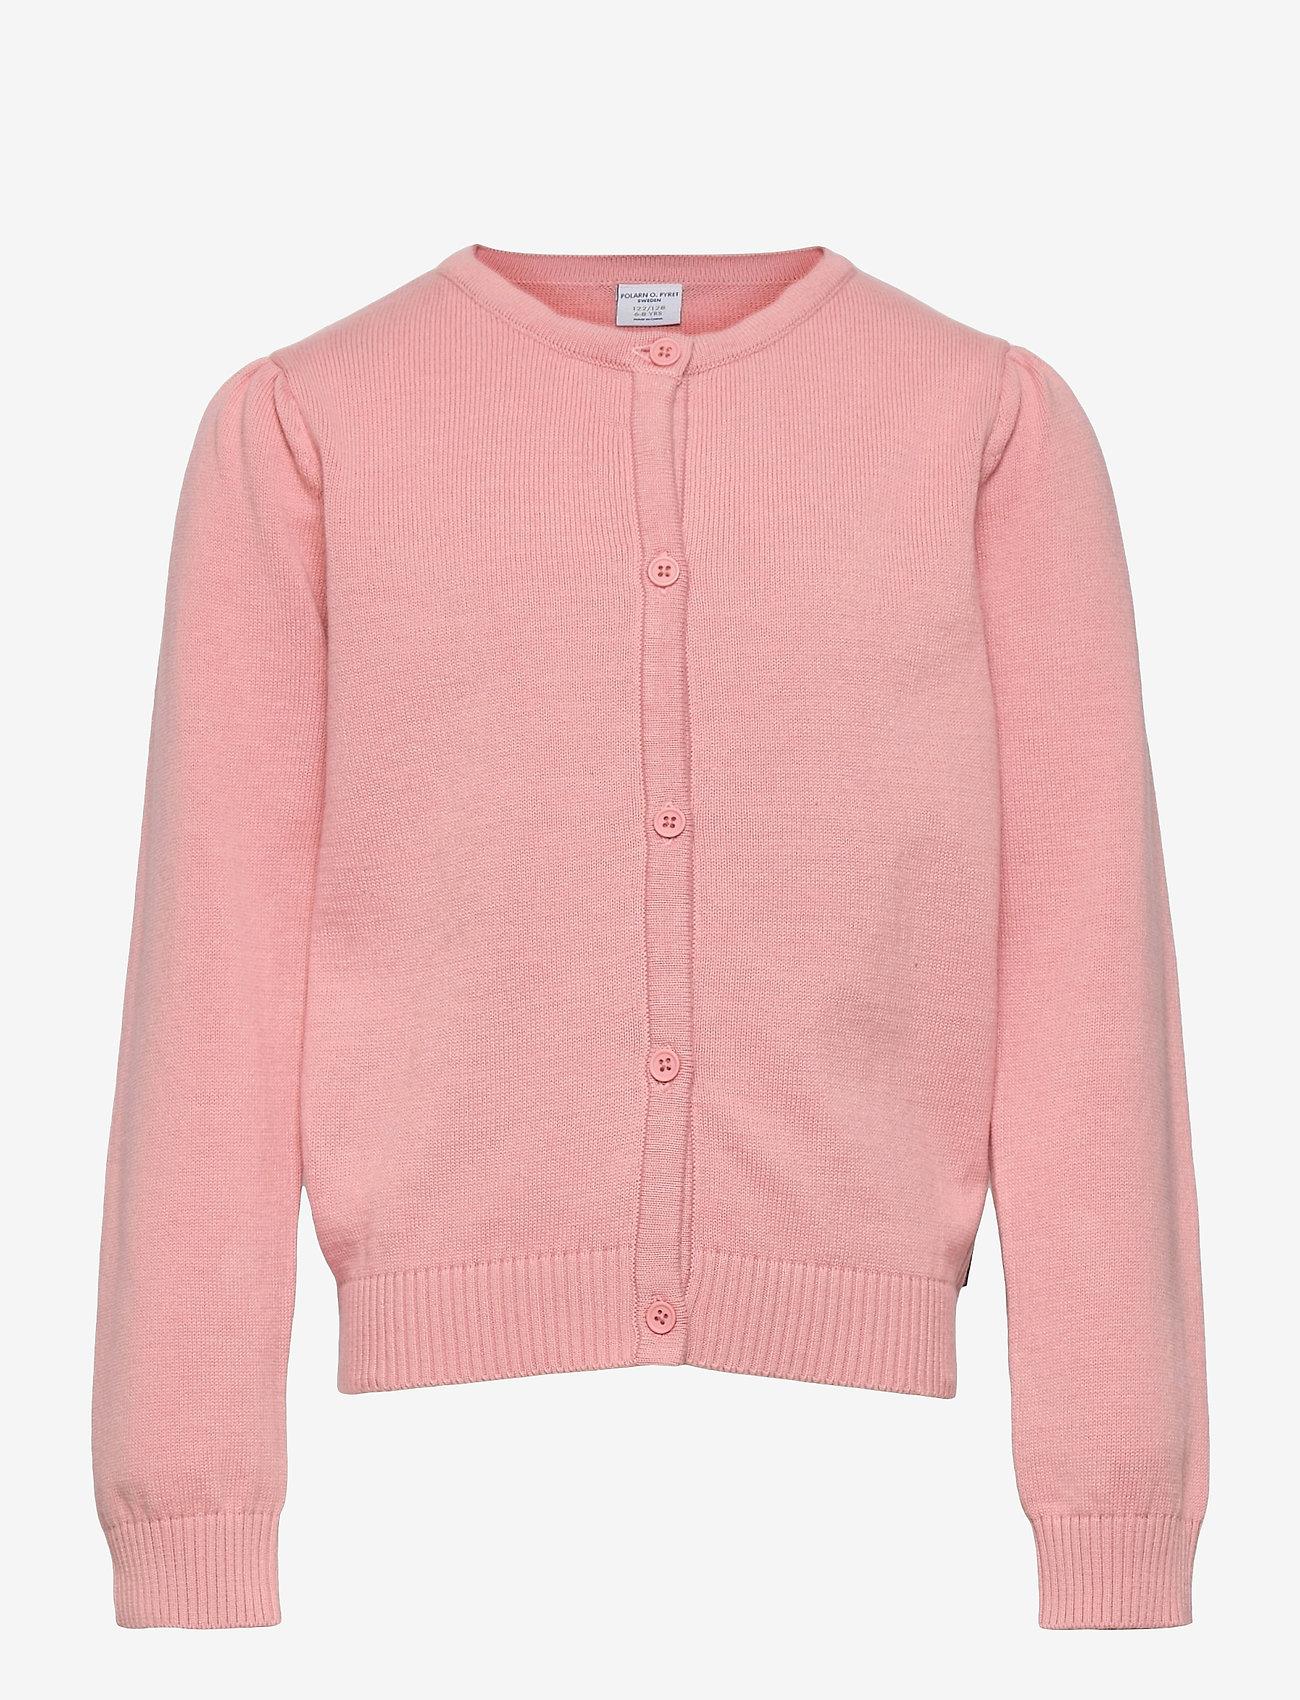 Polarn O. Pyret - Cardigan Knitted Solid School - bridal rose - 0